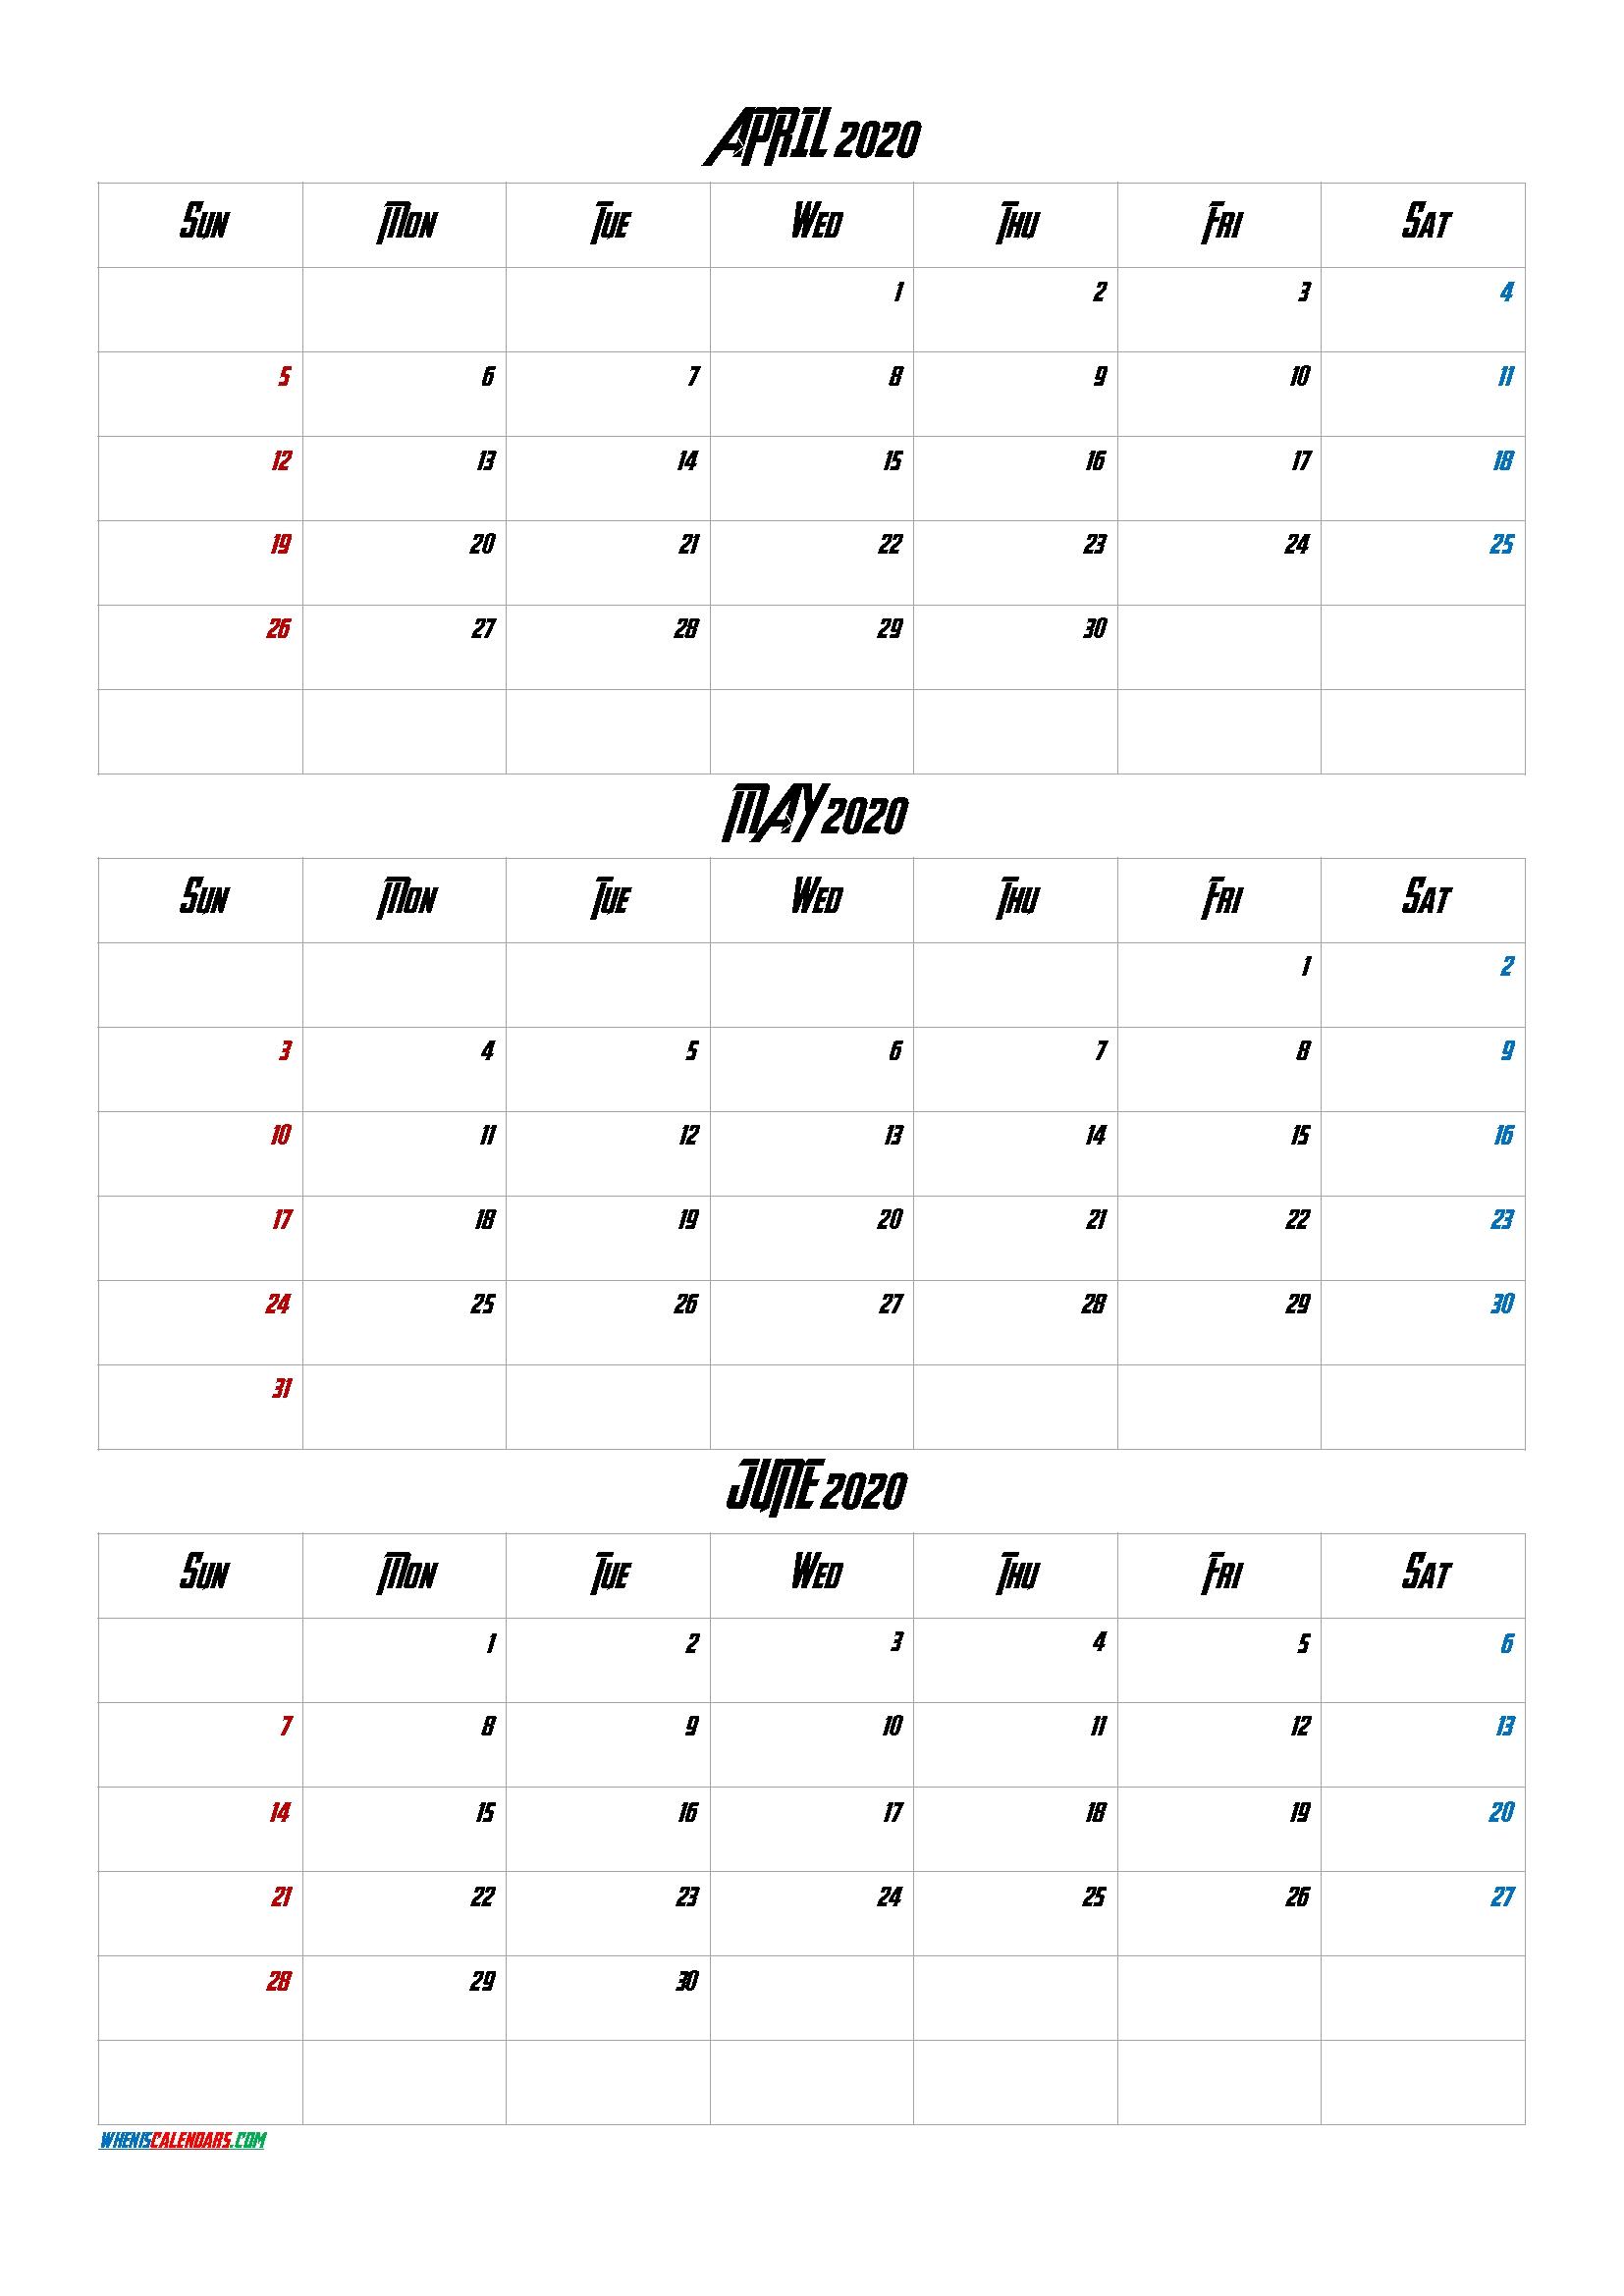 April May June 2020 Three Month Calendar Printable-20Av4